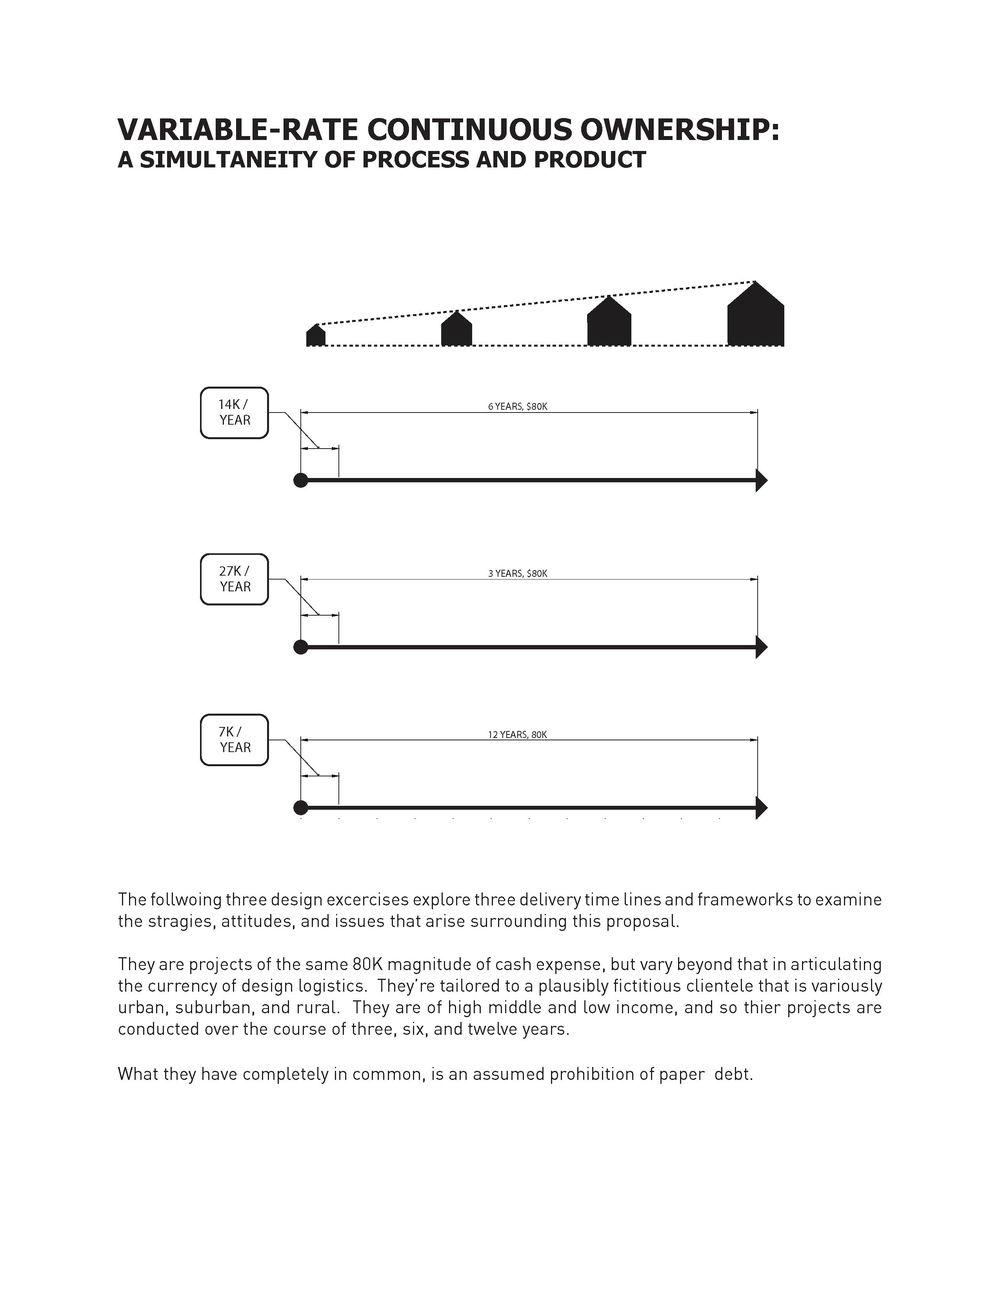 DSA_CMiller_Thesis_Slides_Boards_03_30_2013_Page_18.jpg